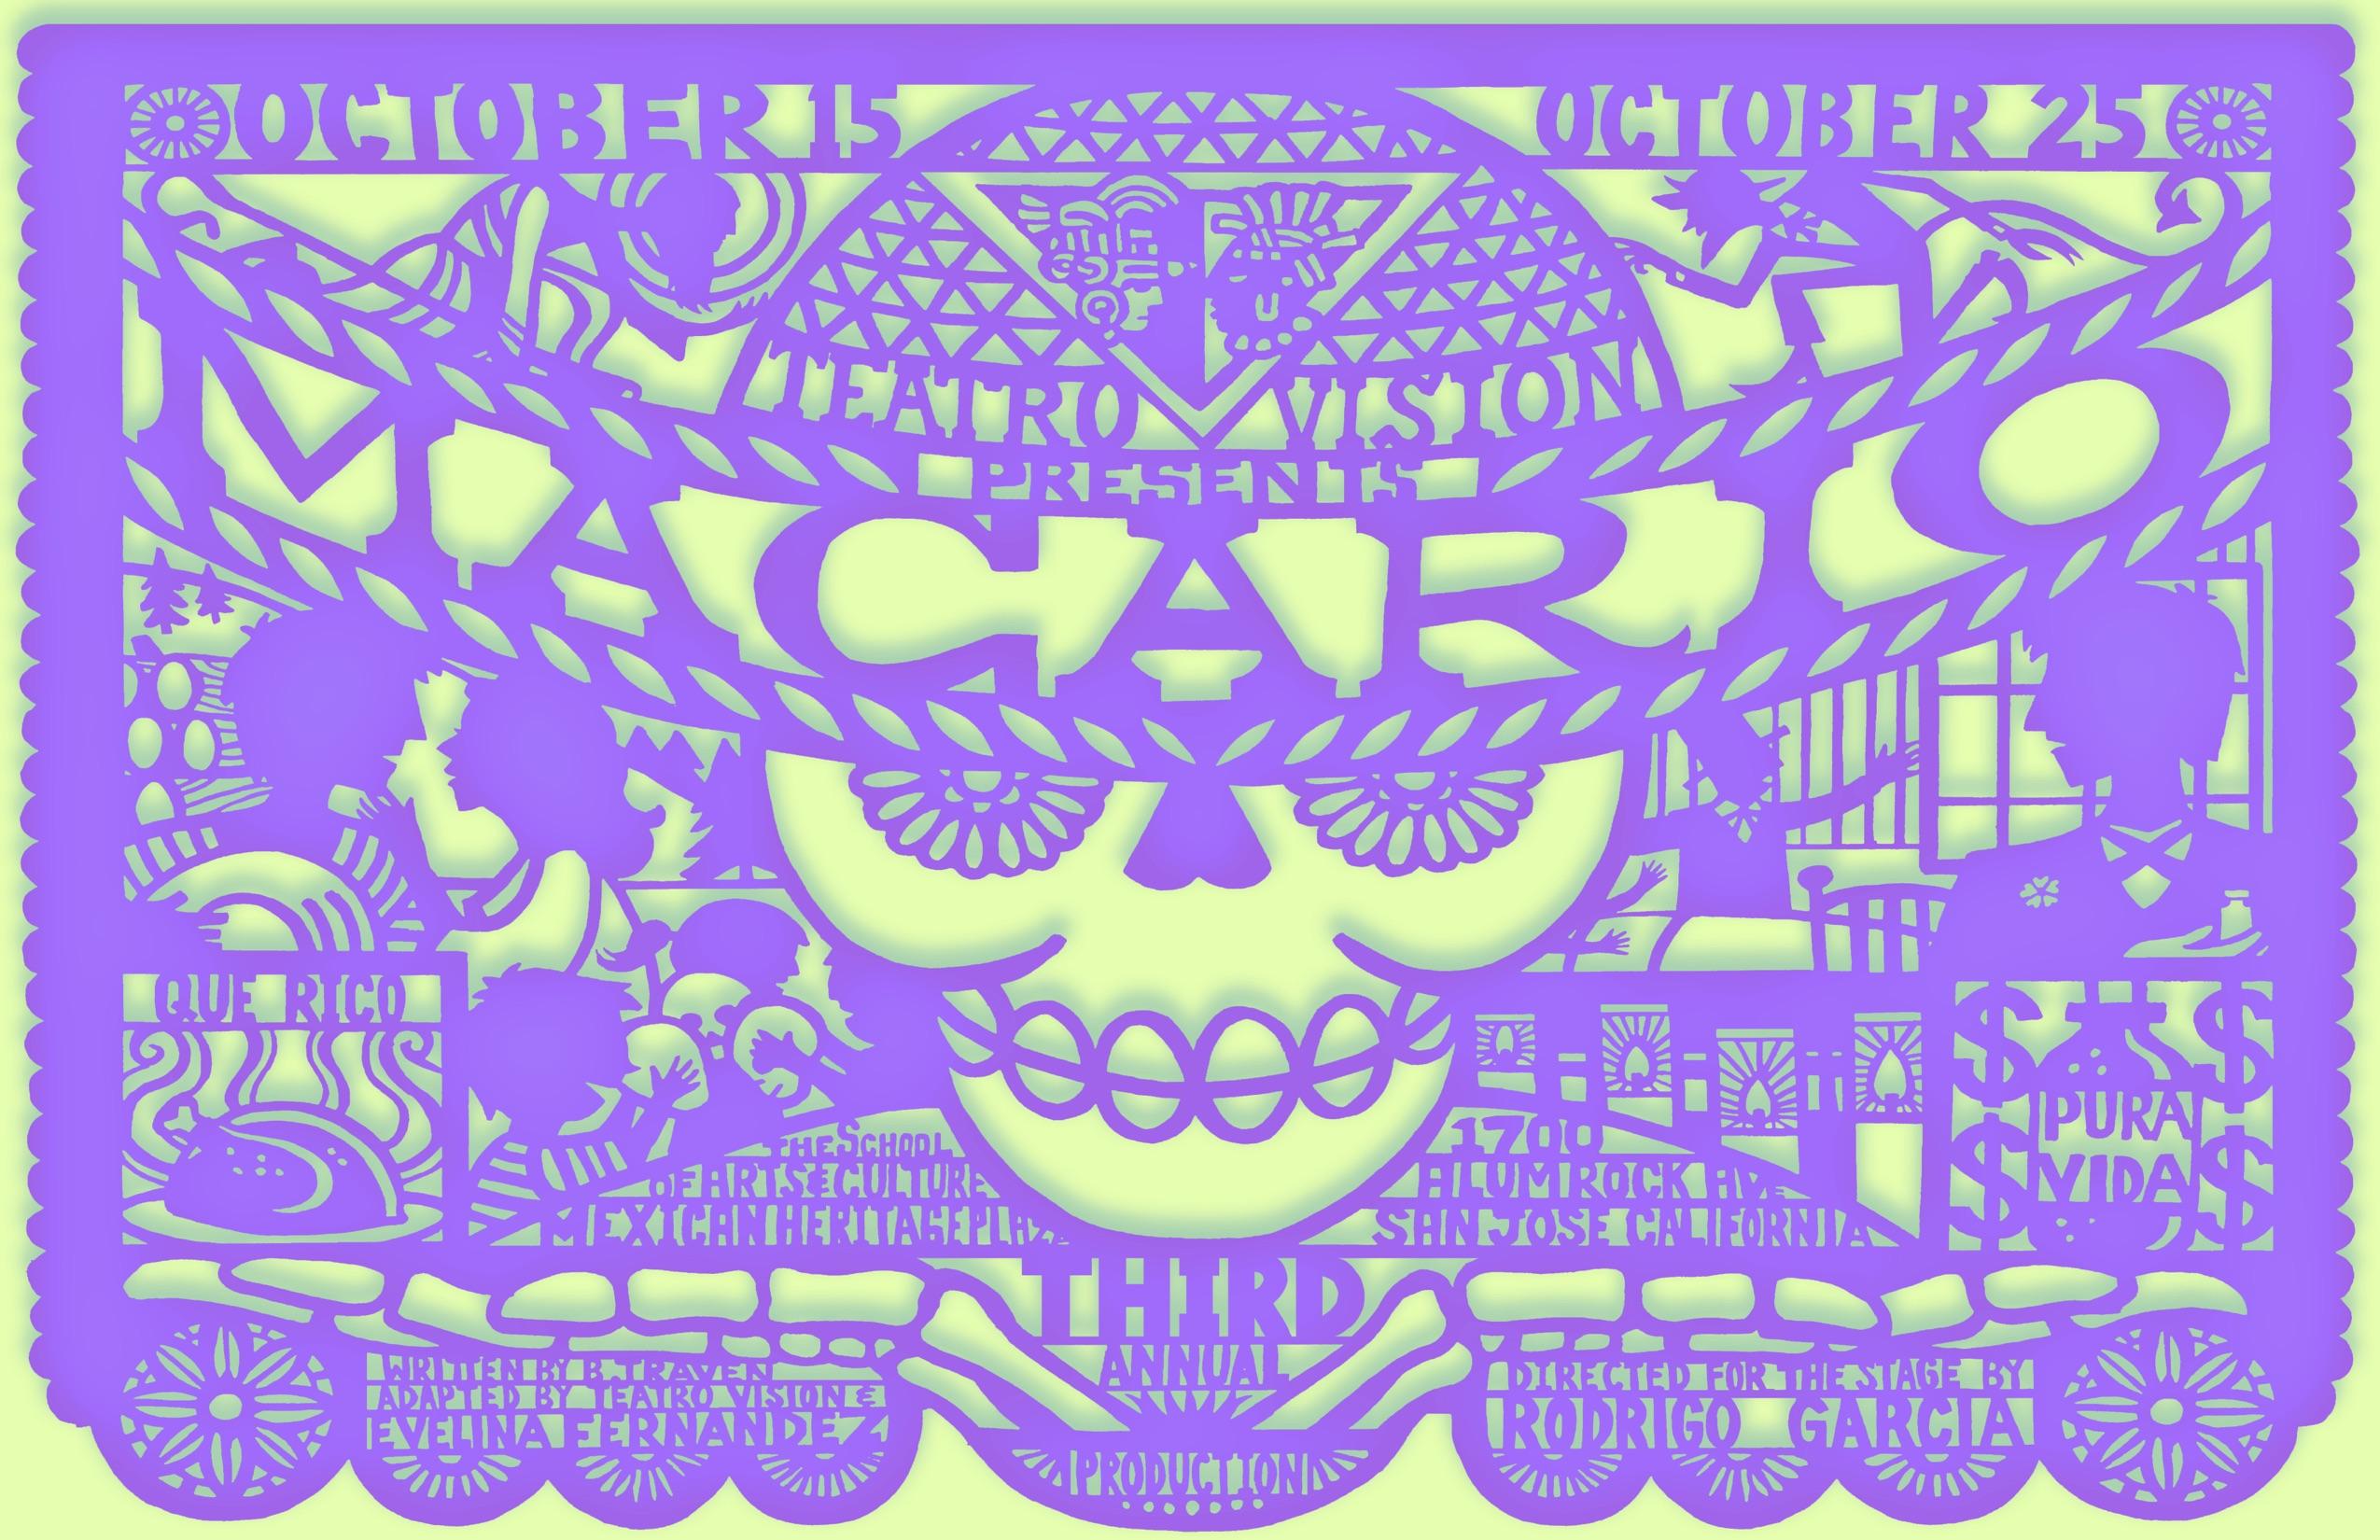 MACARIO print 5 by Manny Silva